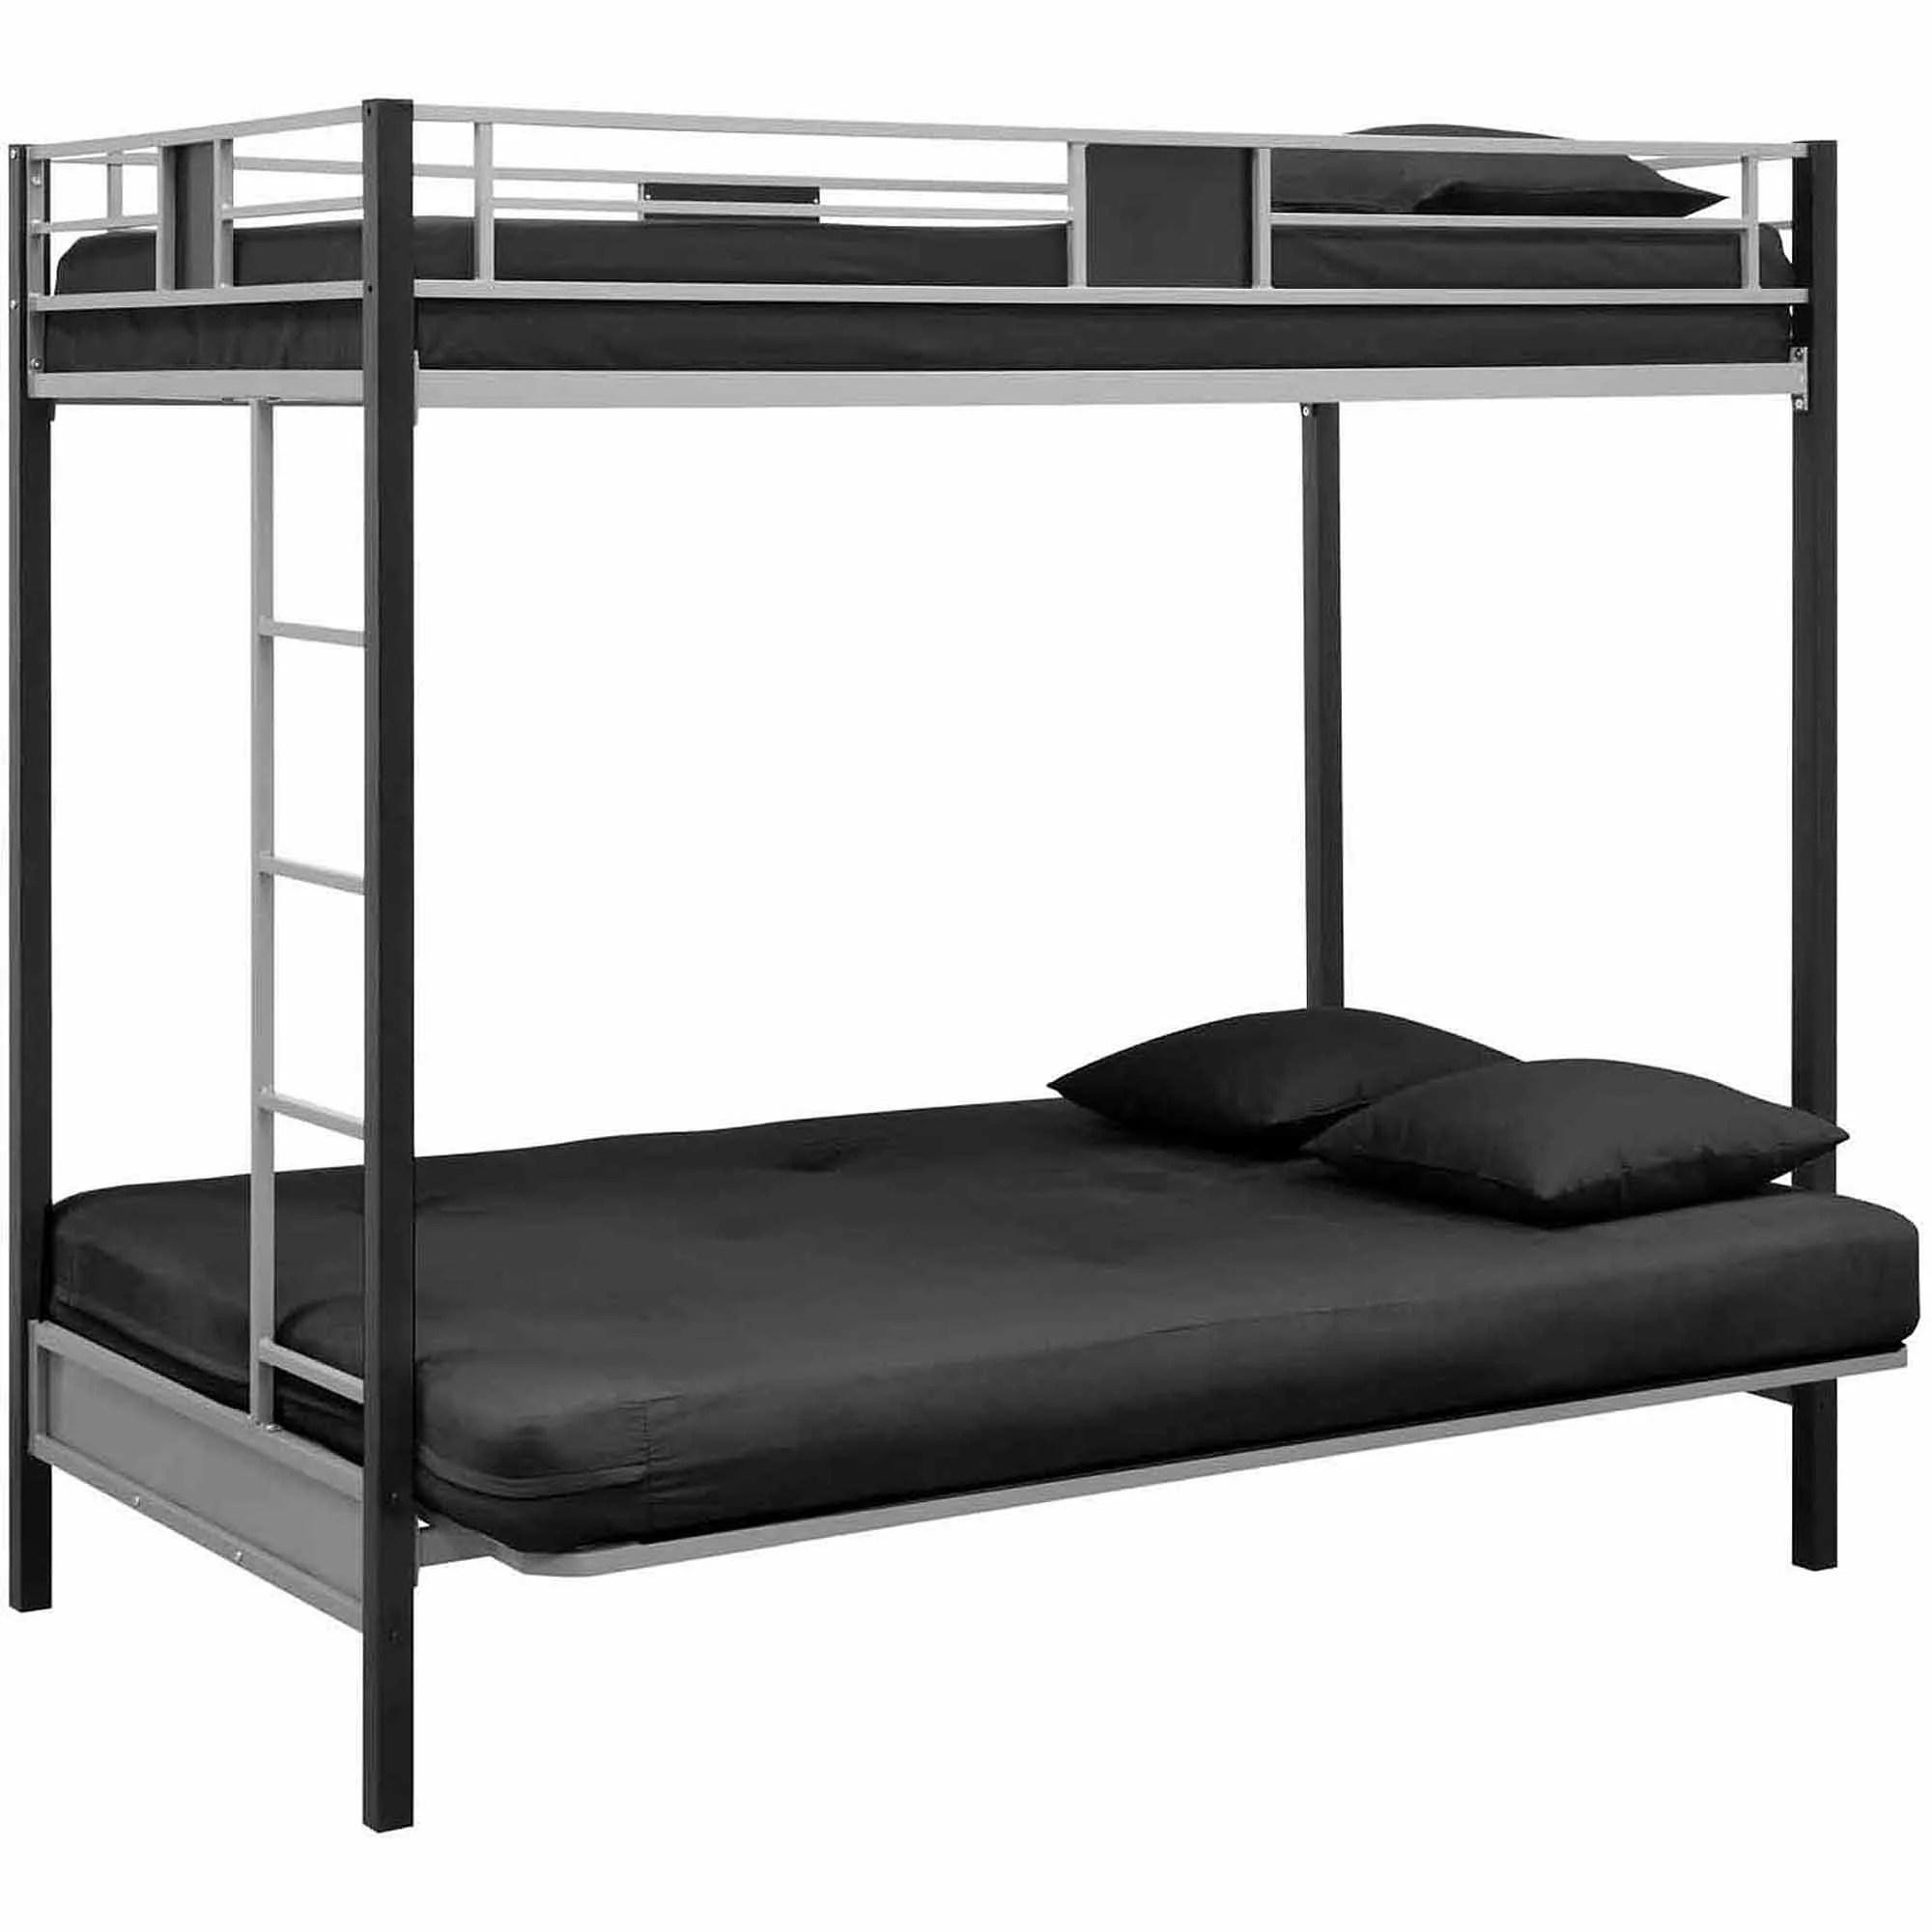 dhp allegra pillow top futon sofa bed sets designs pics how to make a bunk